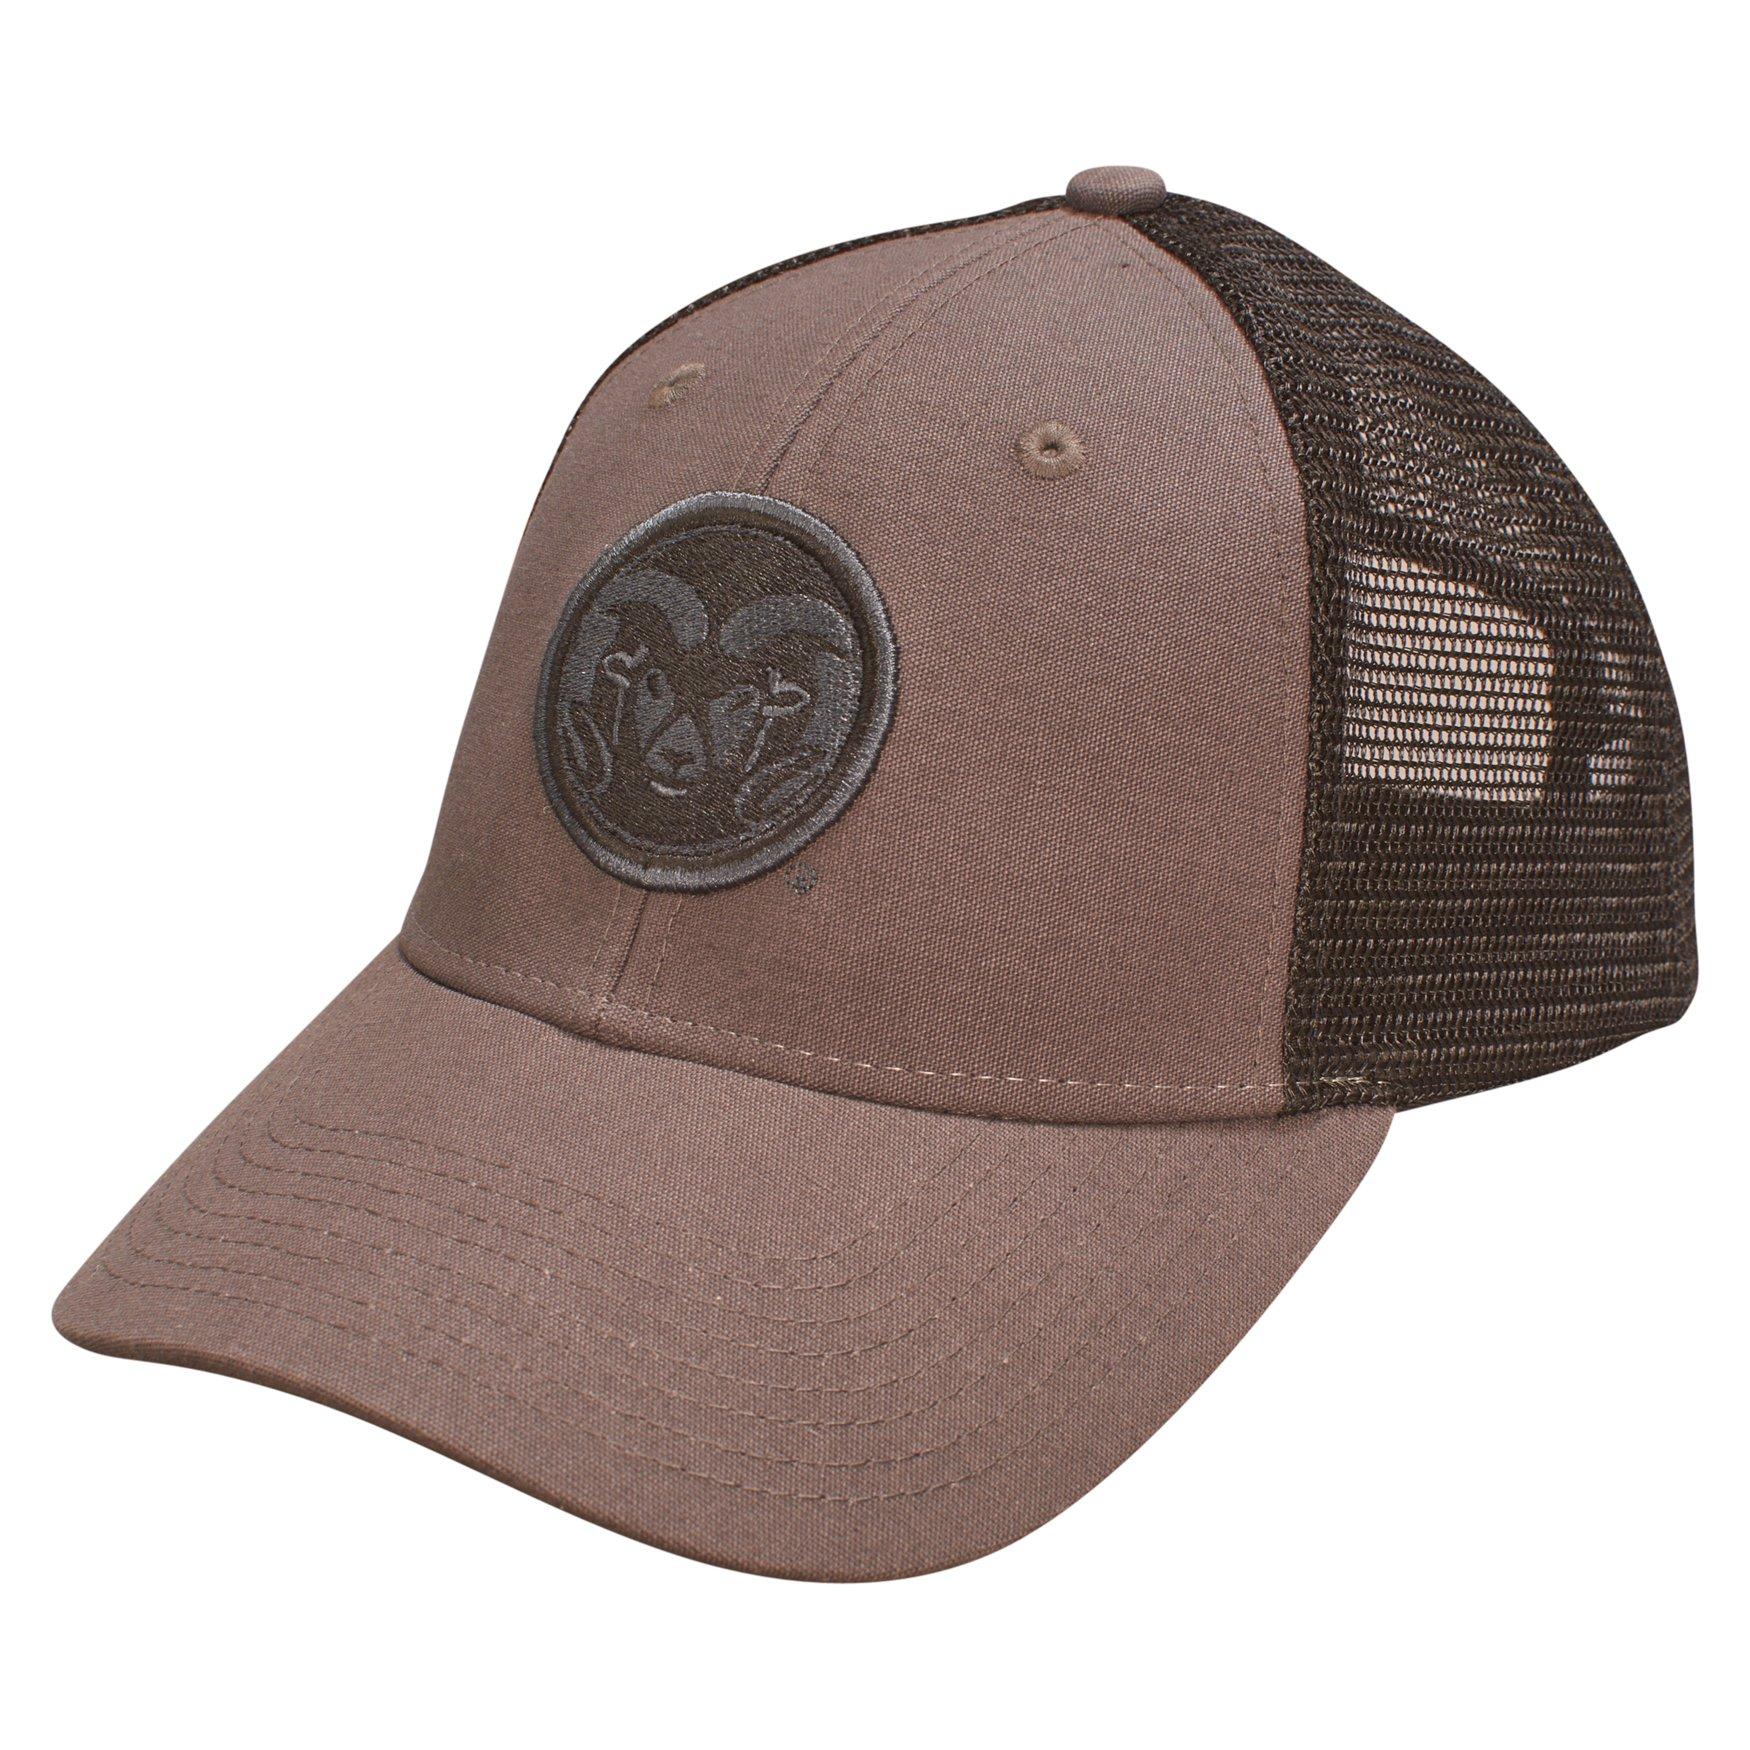 Ouray Sportswear NCAA Colorado State Rams Industrial Canvas Mesh Cap ... 9f4a17133